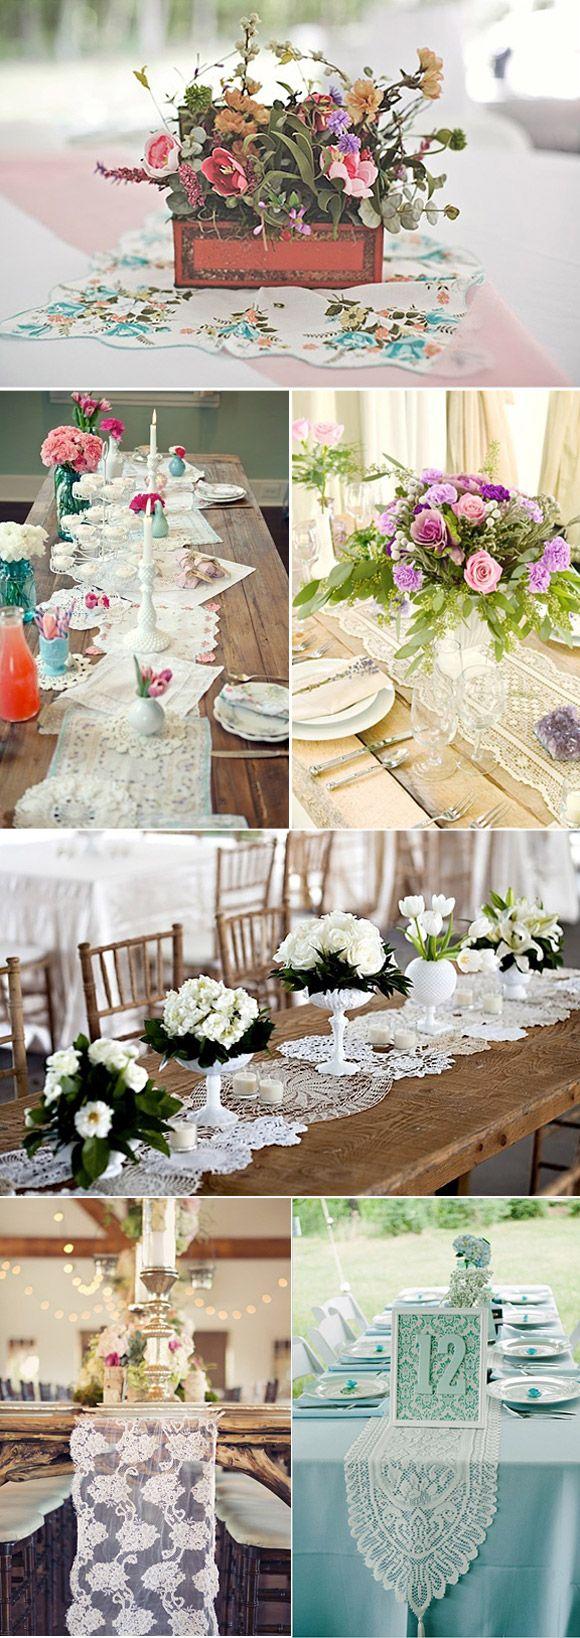 Caminos de mesa originales para decoración de bodas. Wedding decoration table runnersDecor, Wedding, Para Decoración, Wedding Decorations, Path, Original To, Decor Tables, Table, Mesa Originales